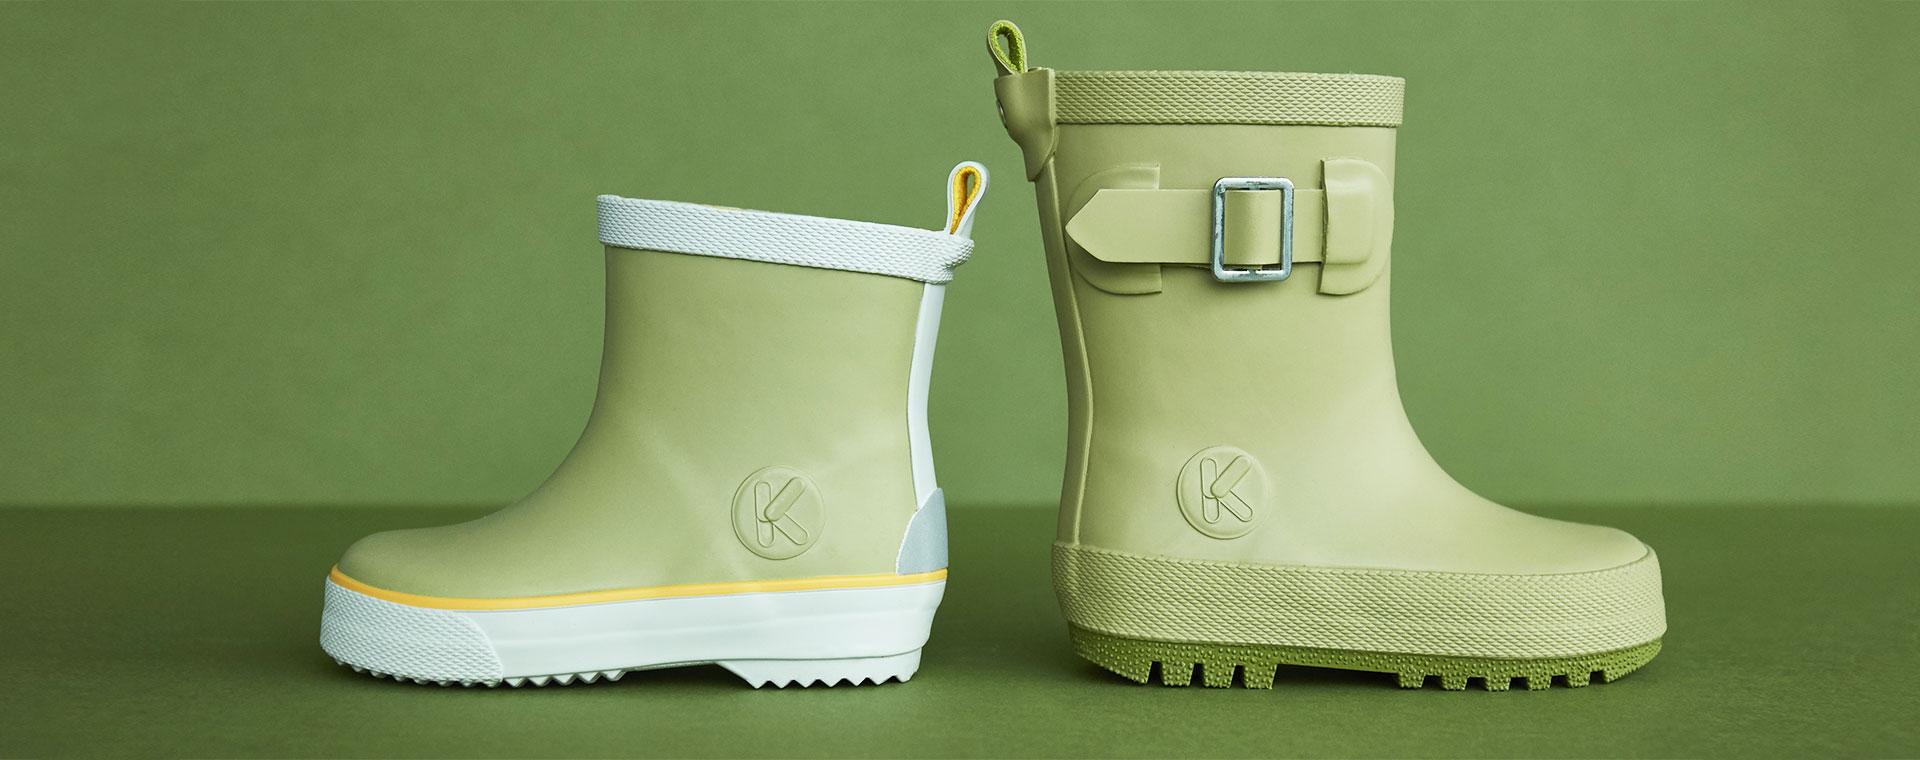 Fern KIDLY Label Rain Boot